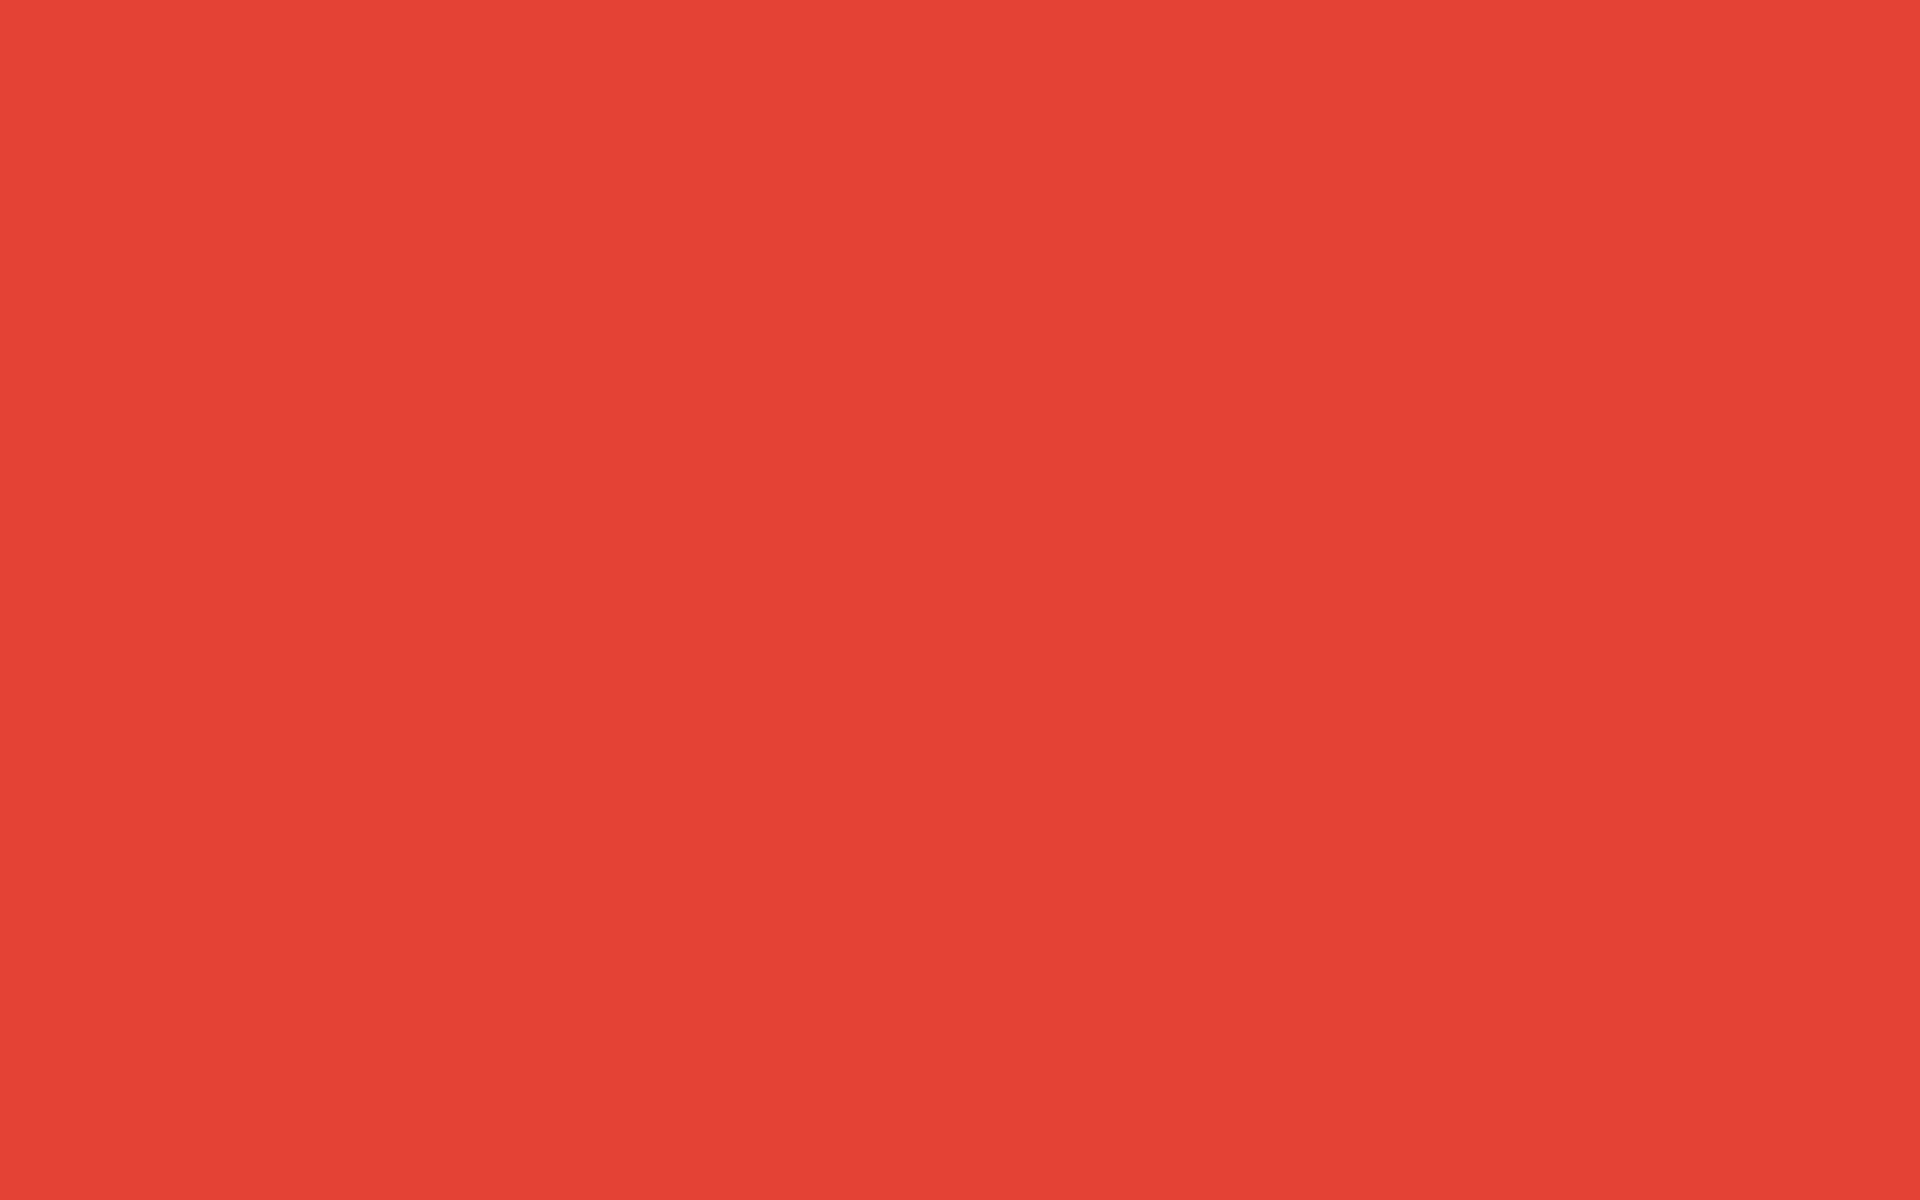 1920x1200 Vermilion Cinnabar Solid Color Background